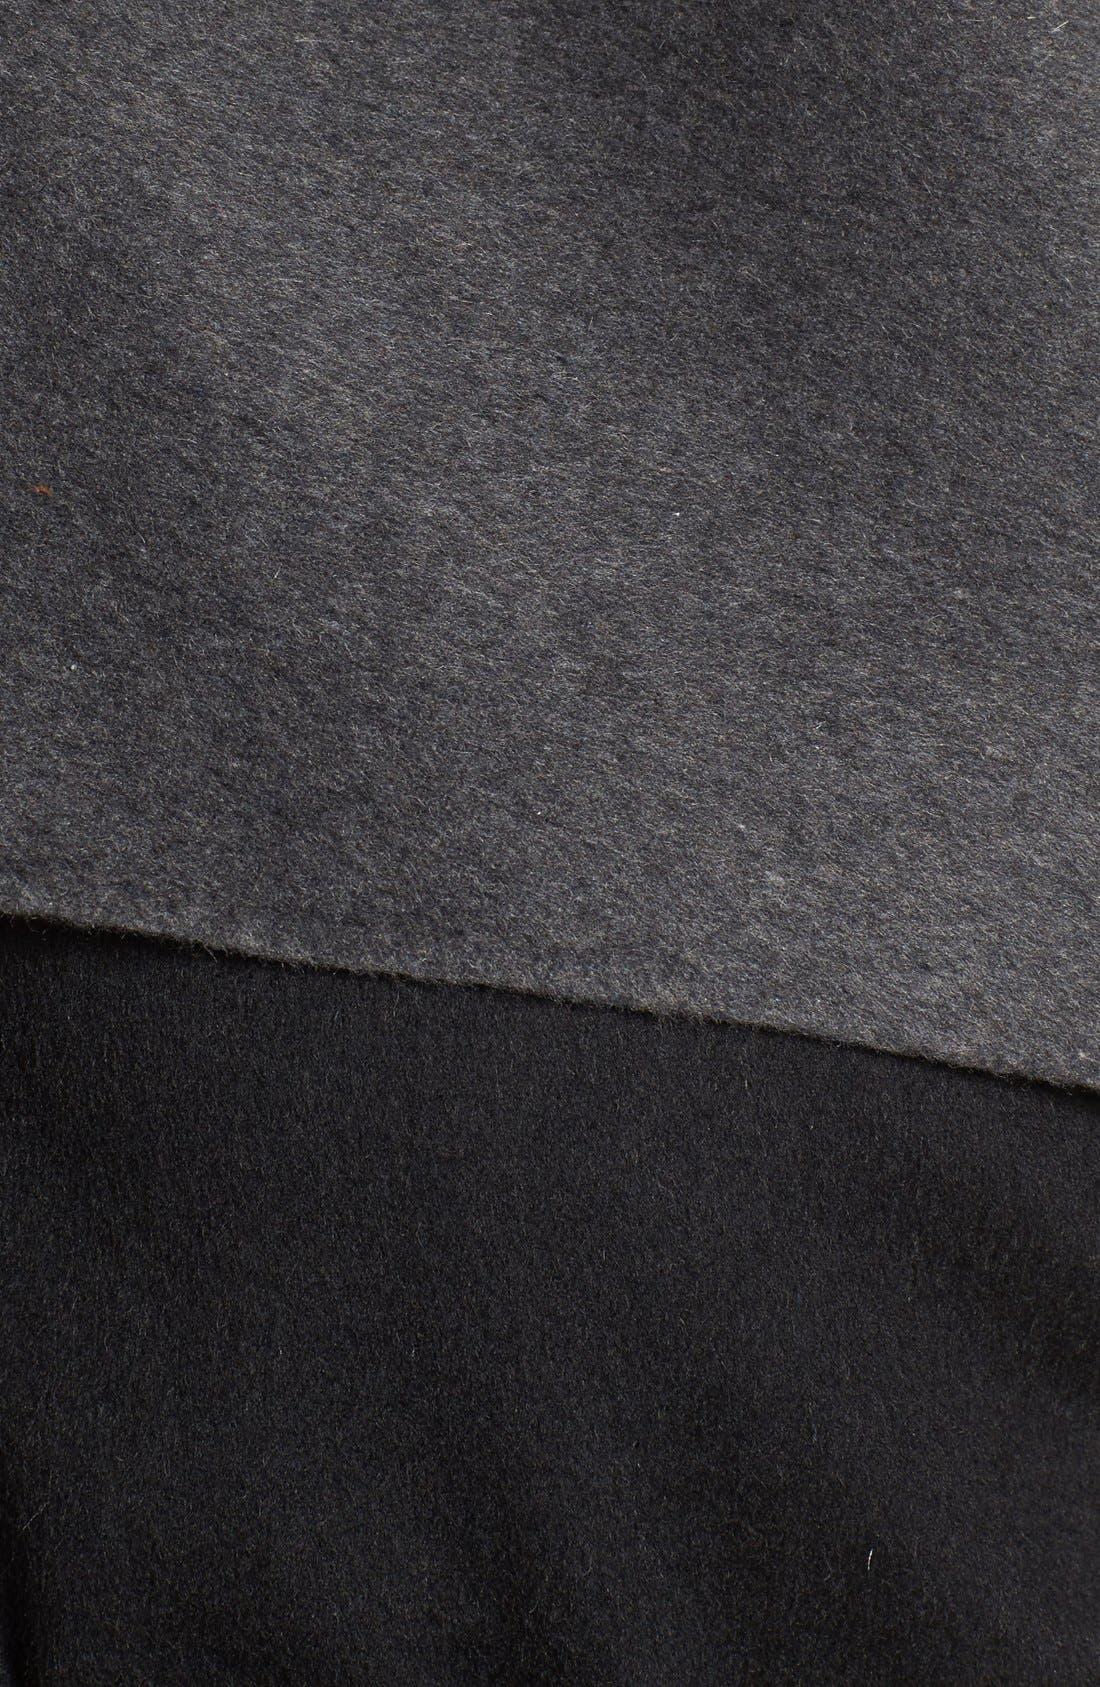 MACKAGE, Leather Sleeve Wool Blend Wrap Coat, Alternate thumbnail 5, color, 001